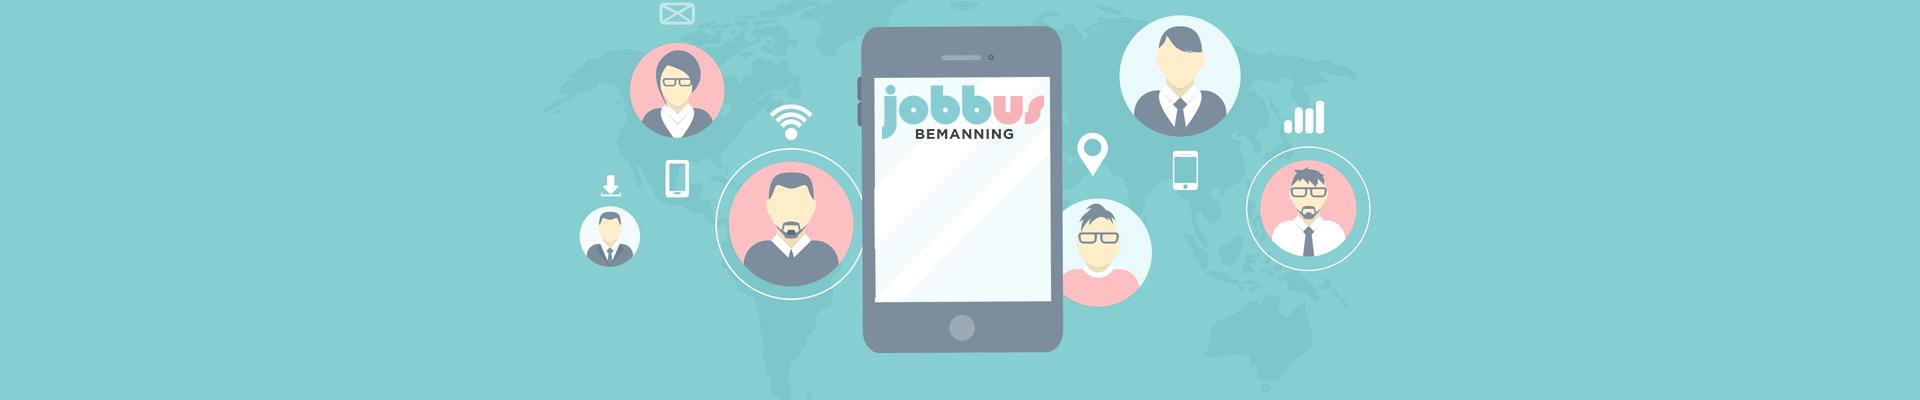 Jobbus Bemannings intro bild